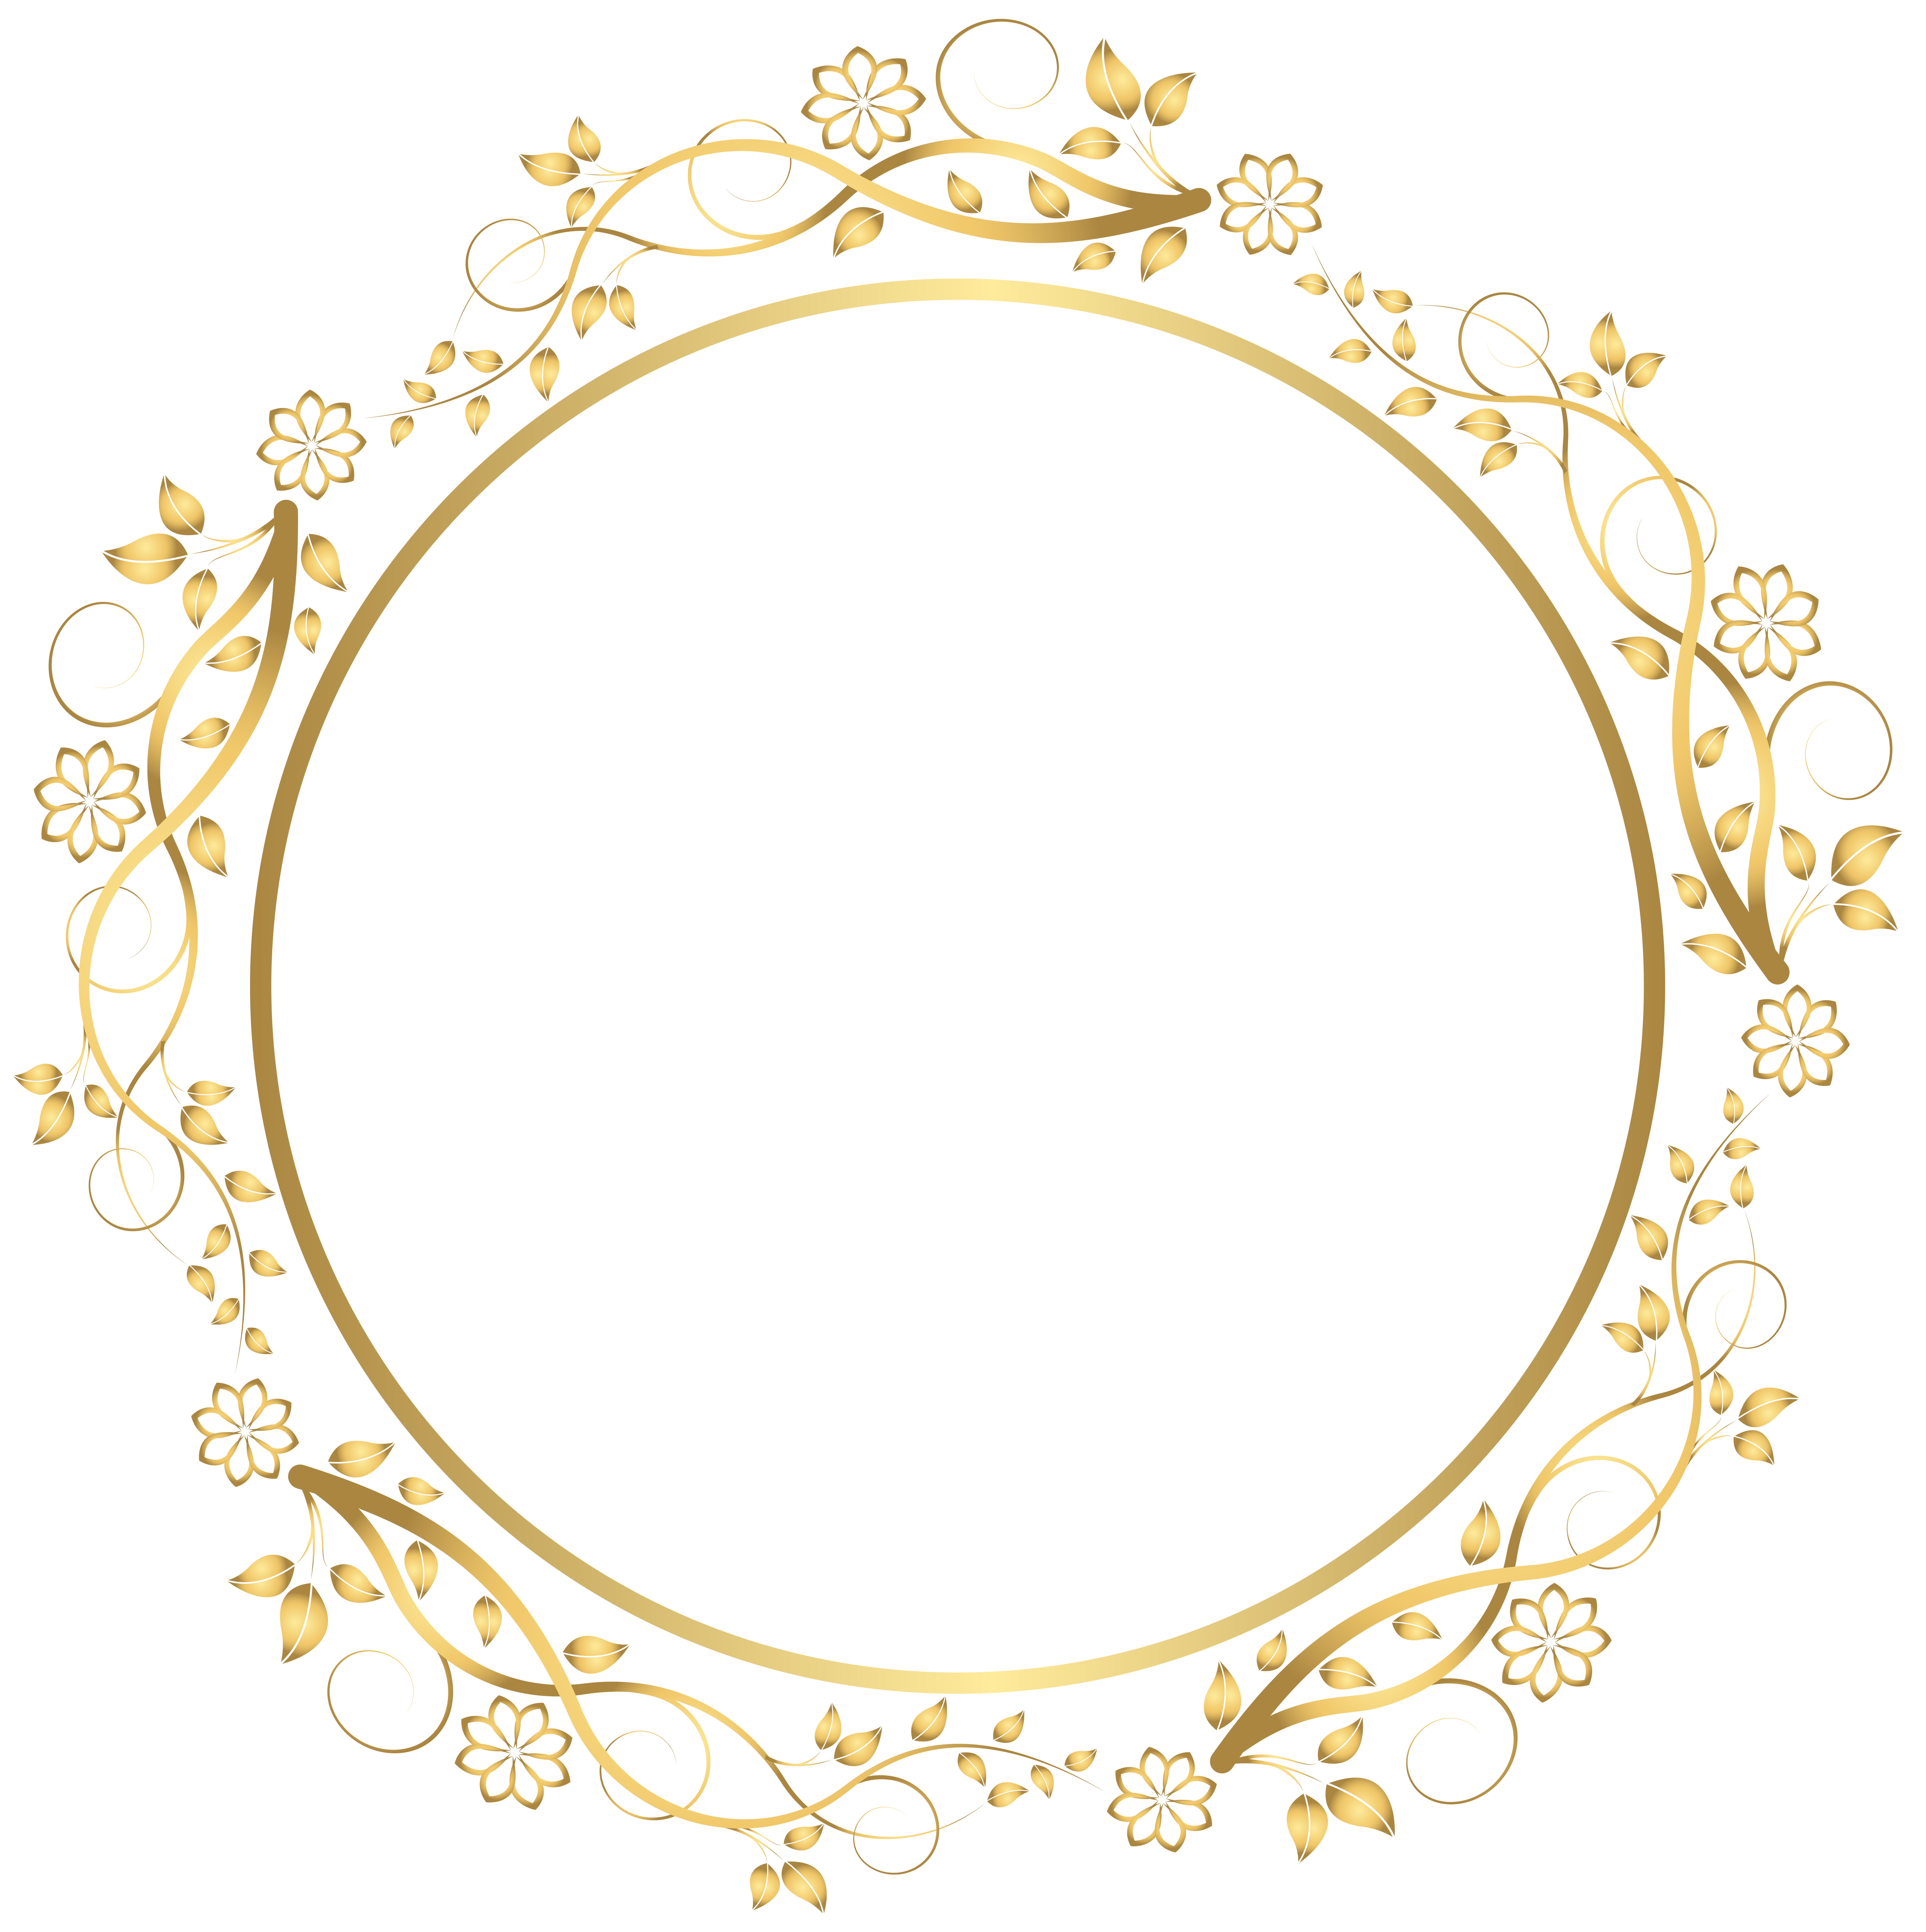 Gold Round Floral Border Transparent PNG Clip Art Image ...